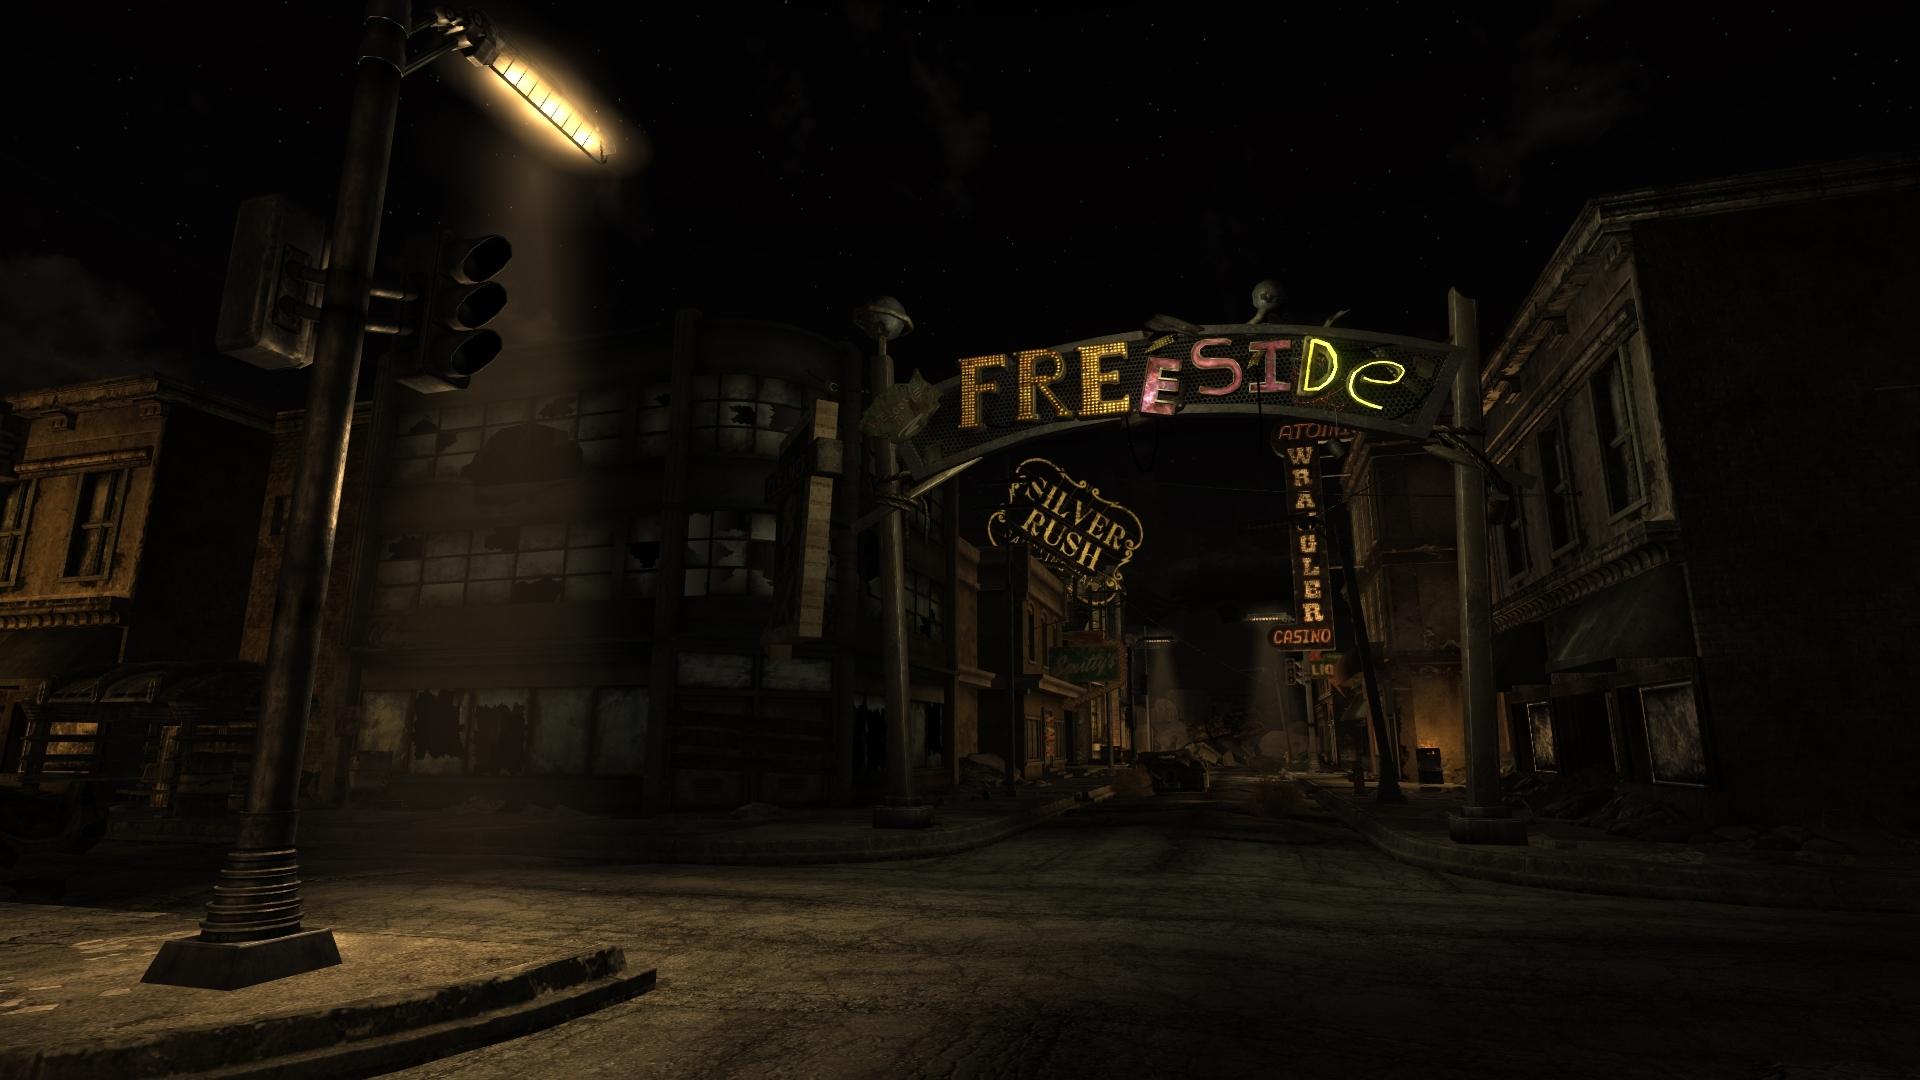 dark city street background 9826 | background check all